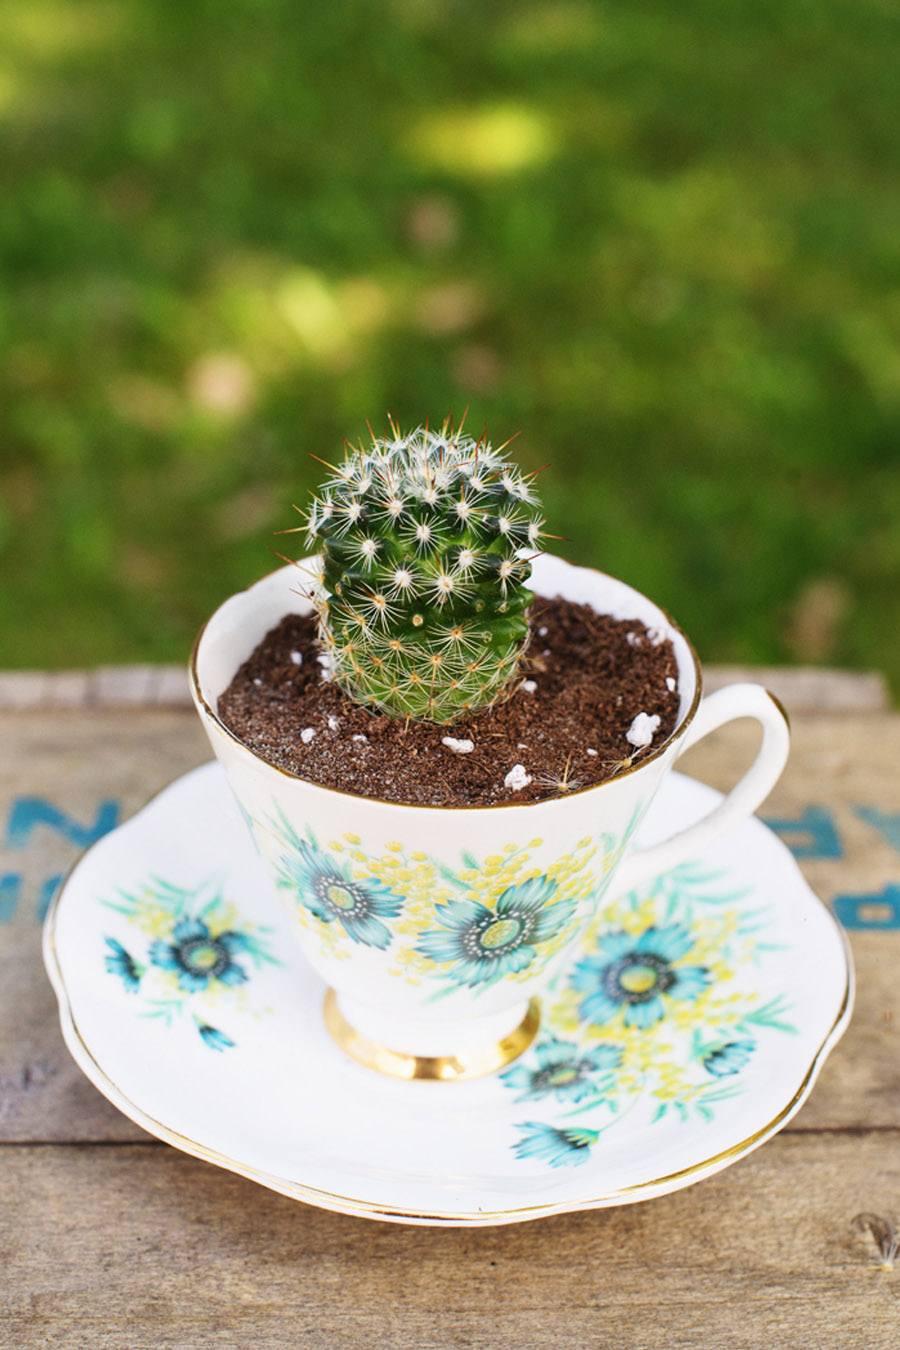 DIY MINI CACTUS EN TAZAS DE TÉ boda-cactus-diy